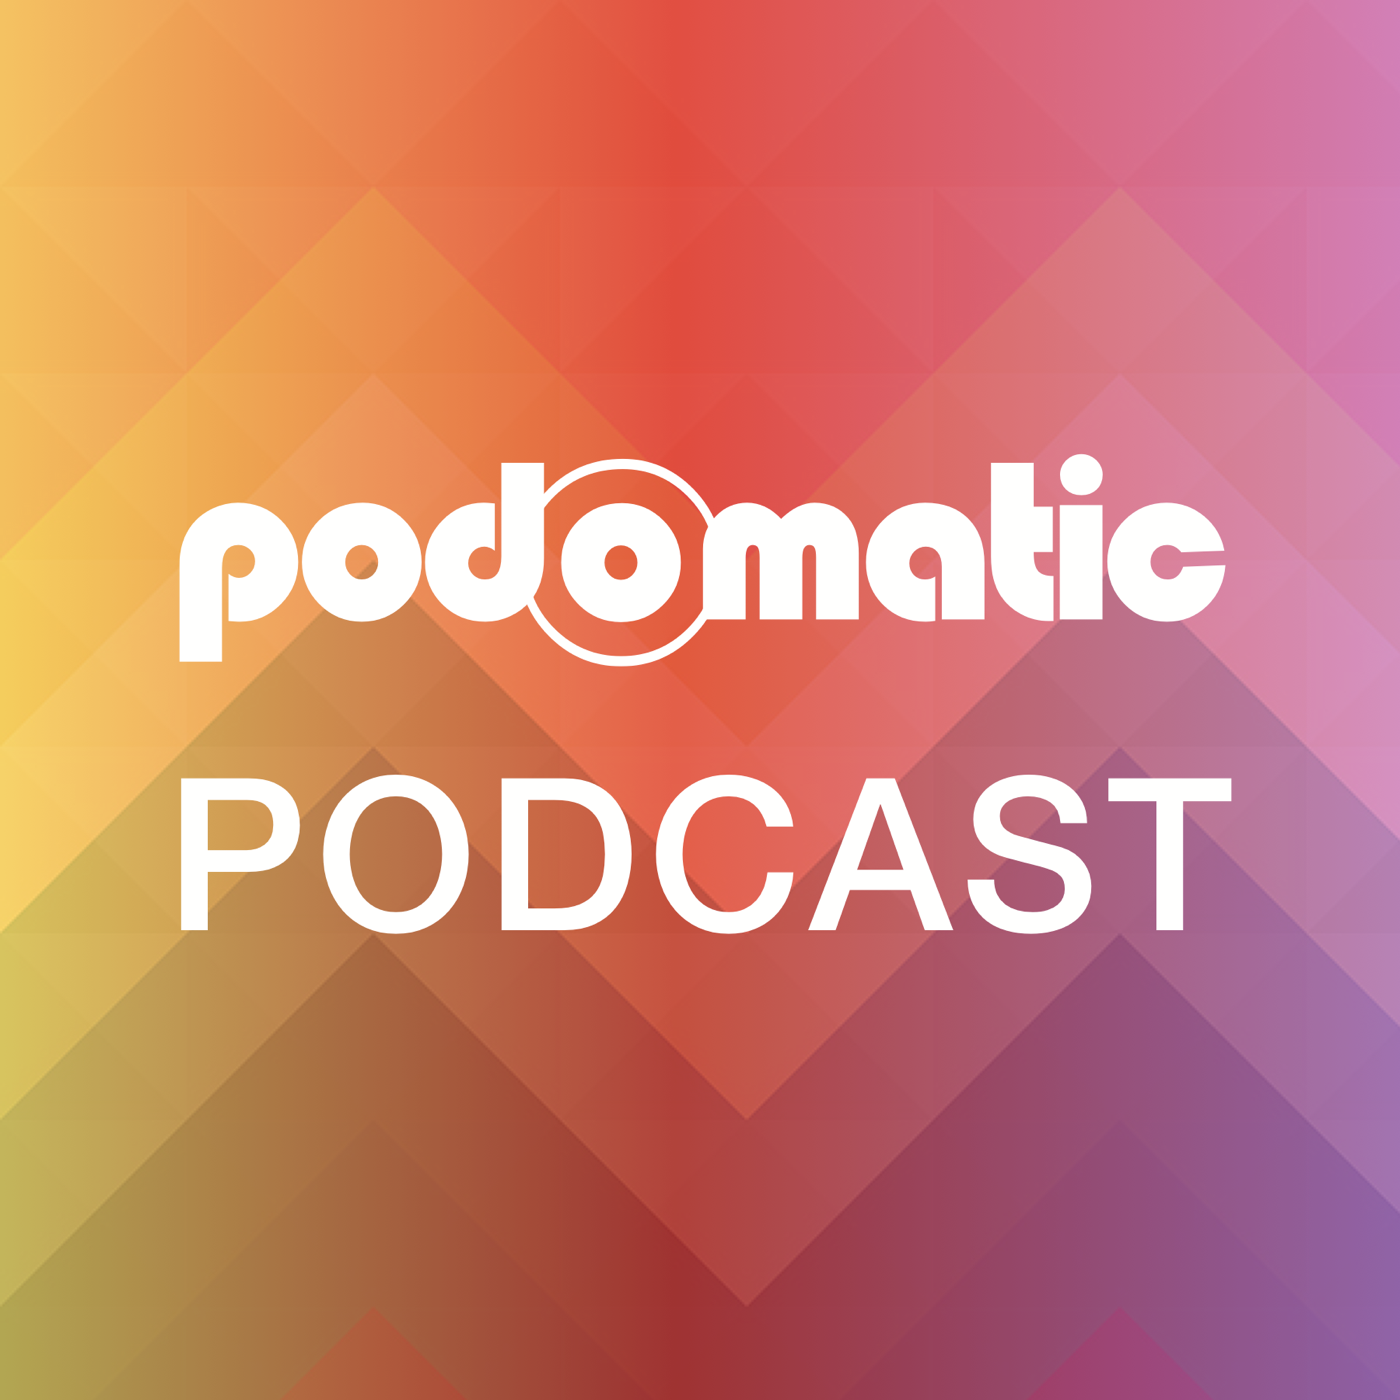 Joshua Eisenhauer's aka djandroid former Podcast